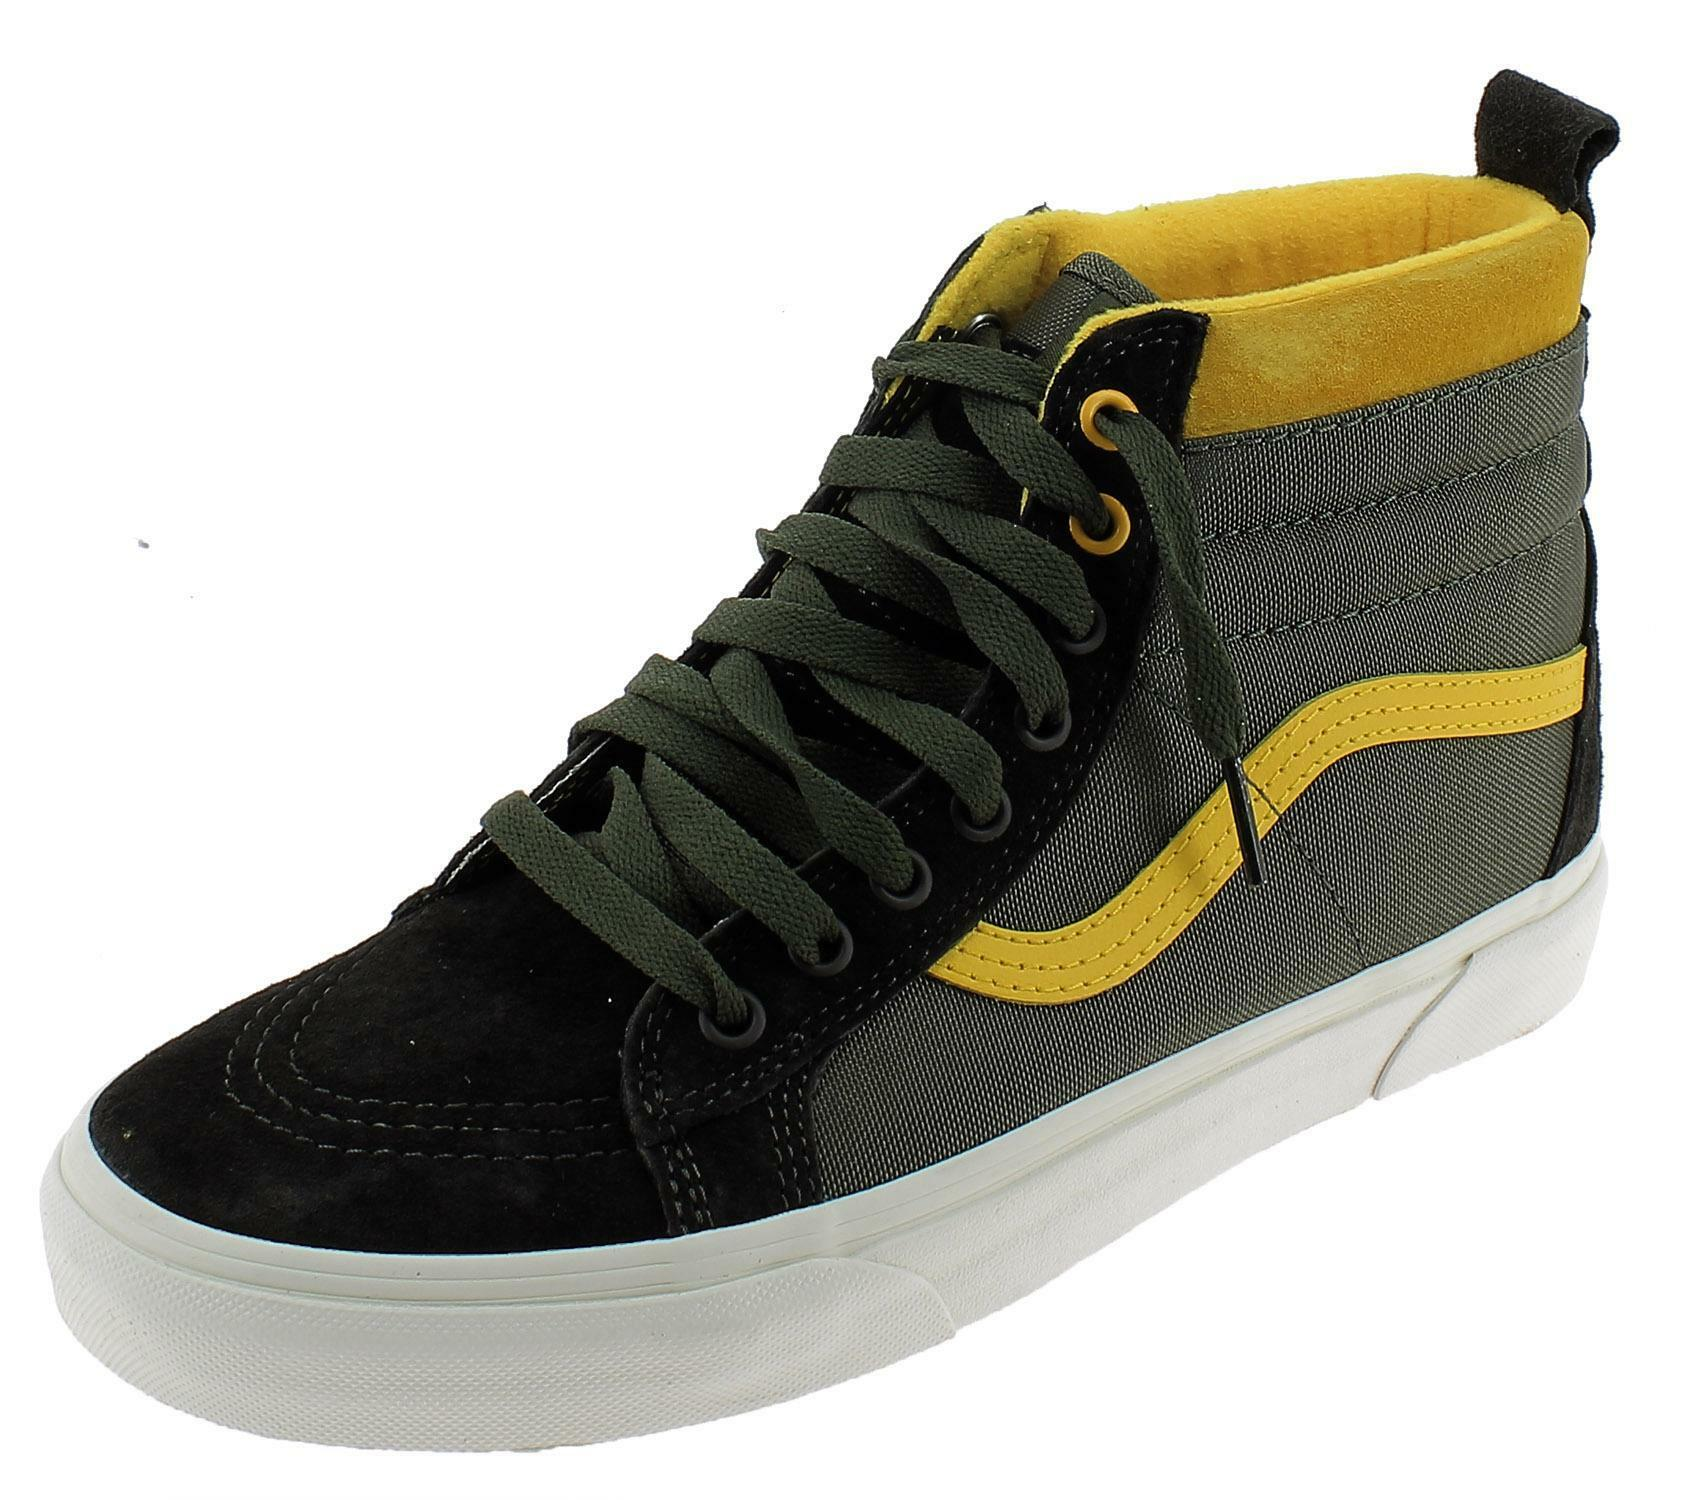 Vans sk8-hi mte scarpe sportive uomo verdi vn0a4bv72uo1